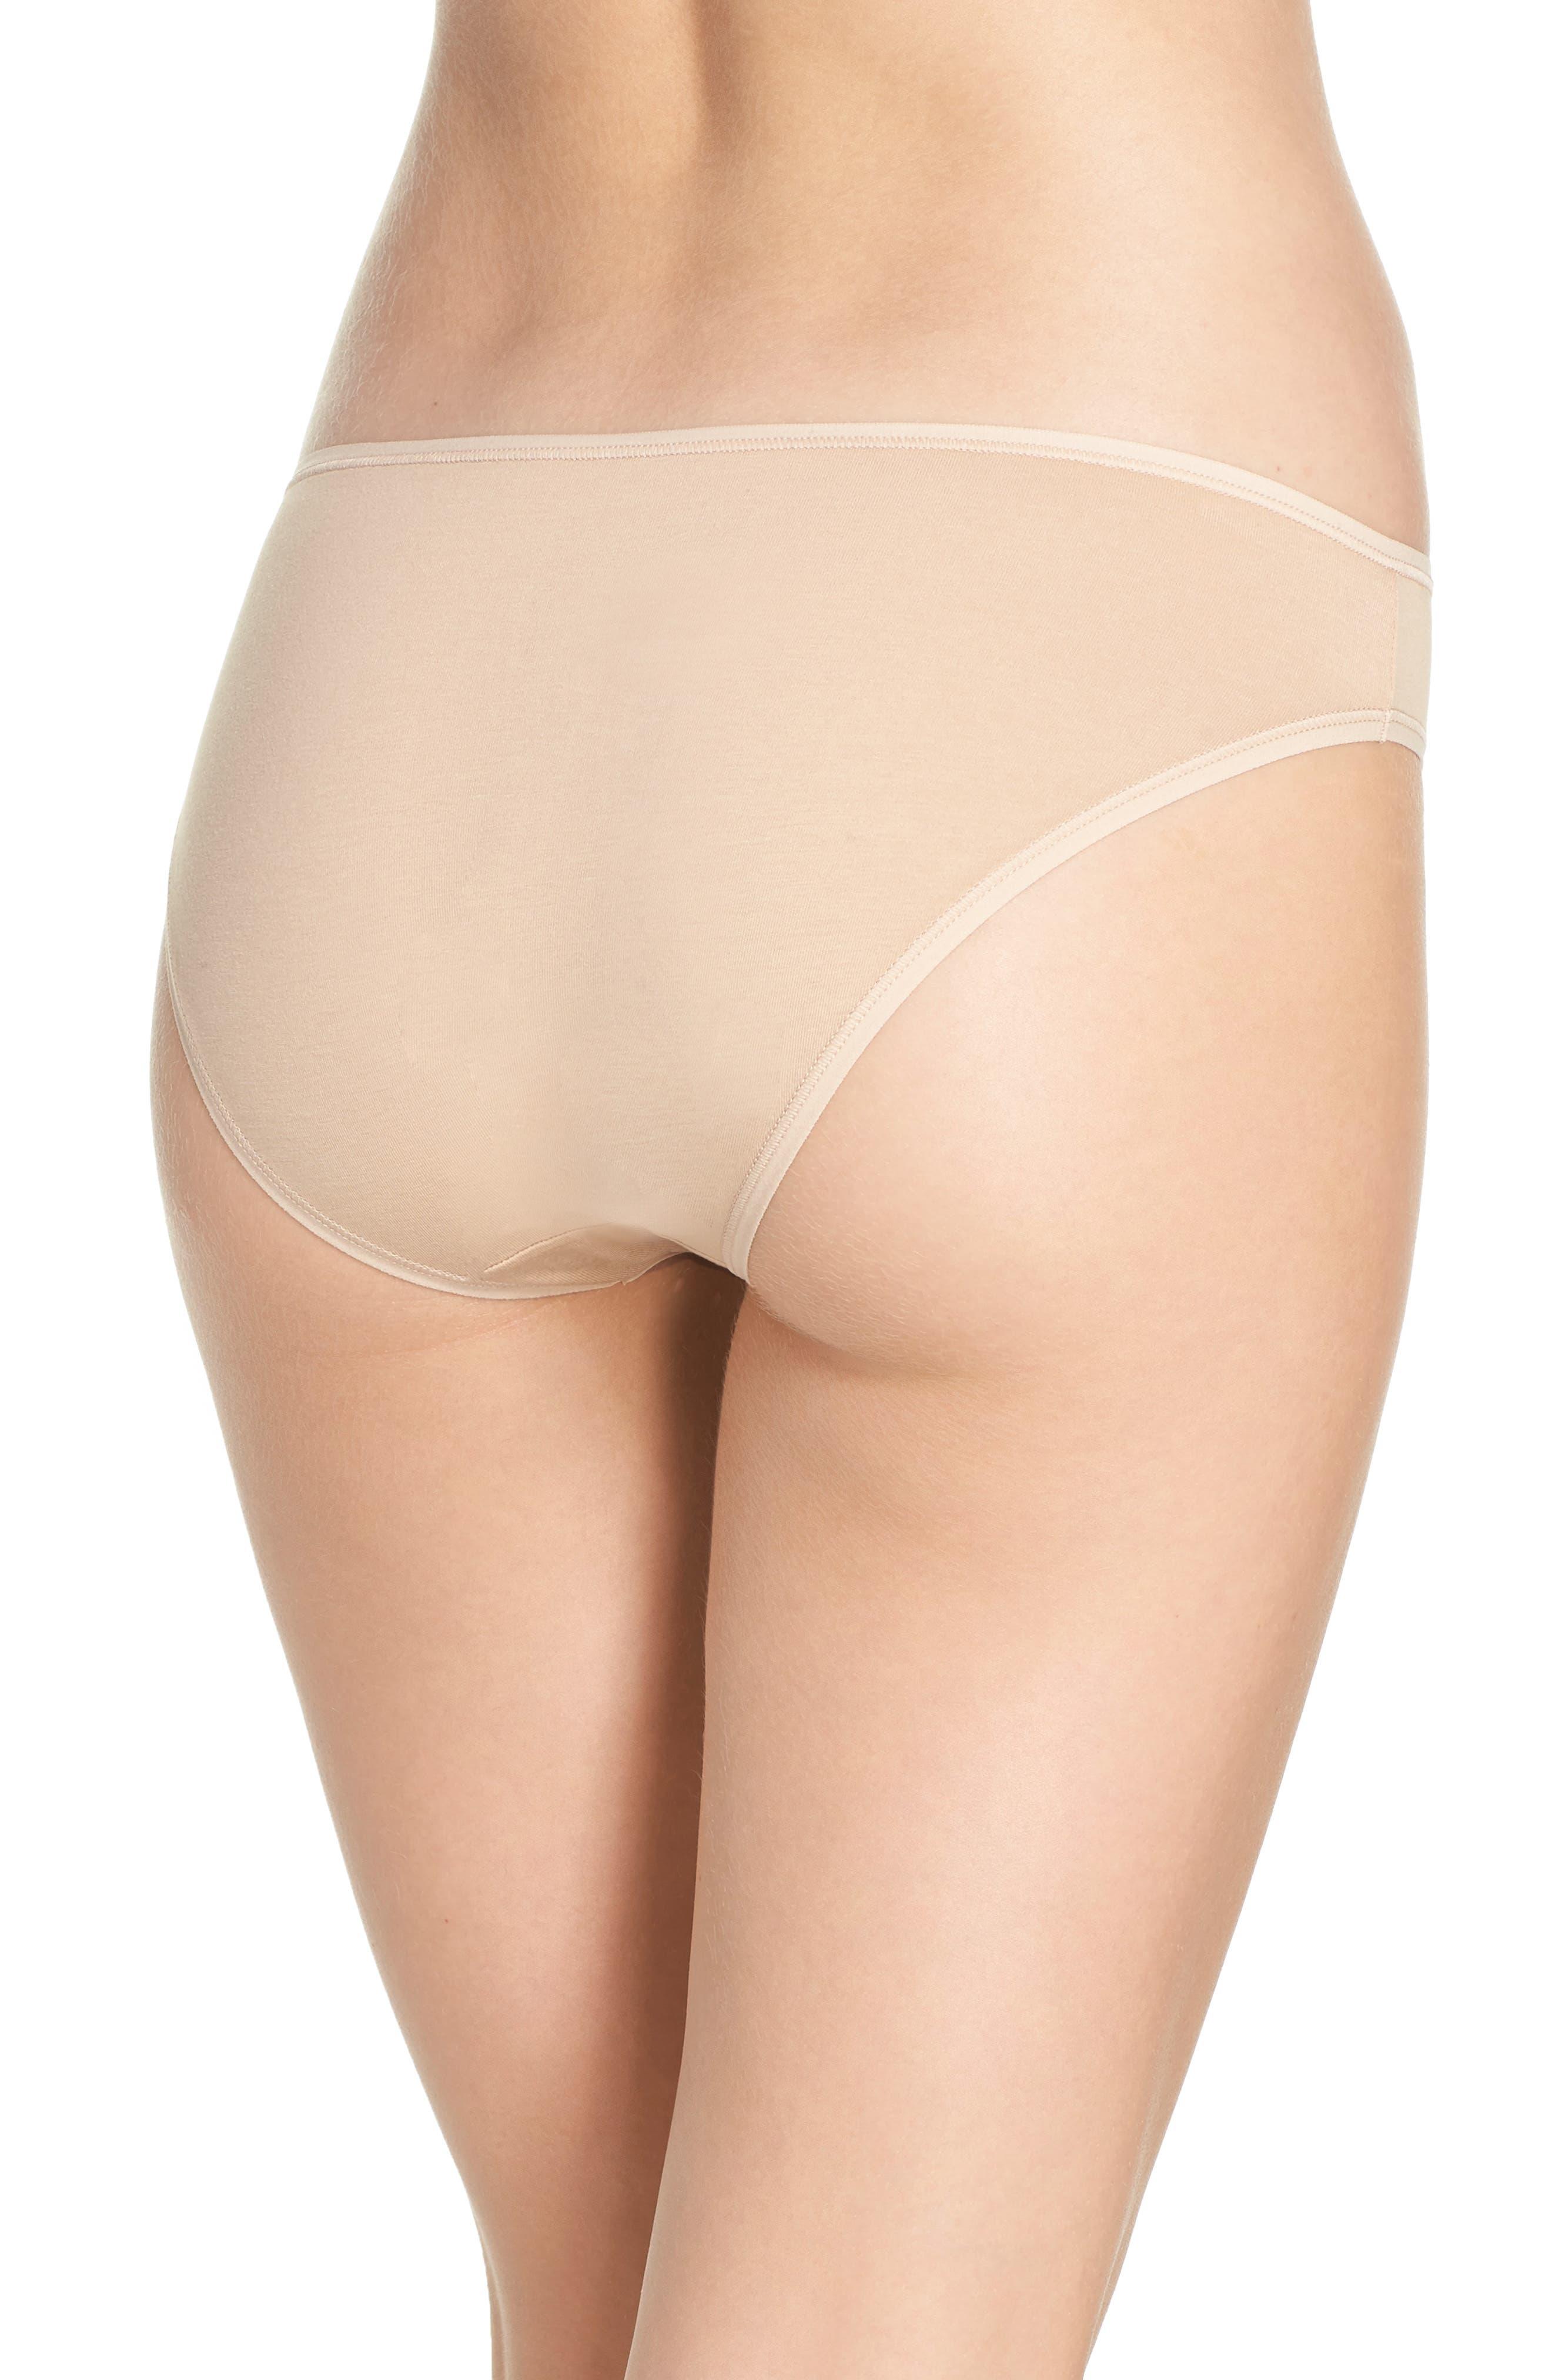 Alternate Image 2  - Calvin Klein Form Bikini (3 for $33)